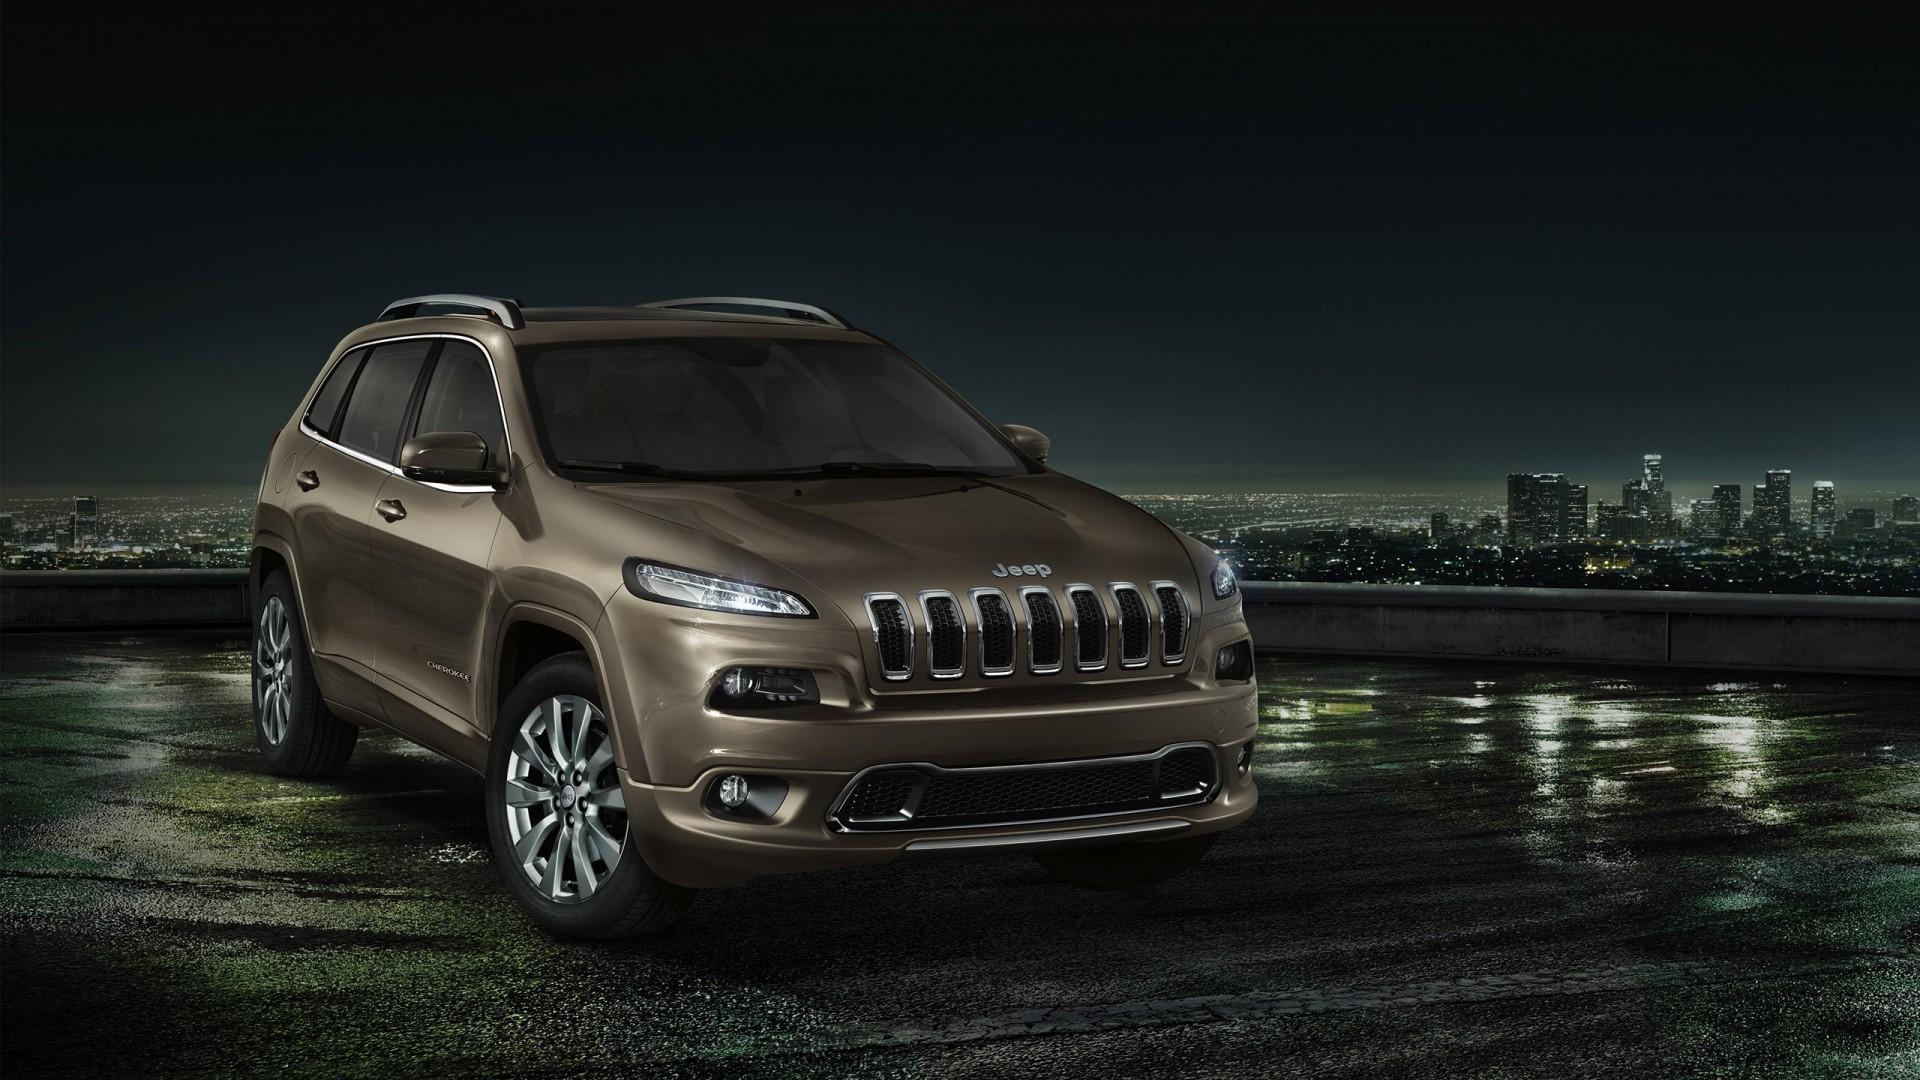 2016 Grand Cherokee Limited >> 2017 Jeep Grand Cherokee Wallpaper   HD Car Wallpapers   ID #6201